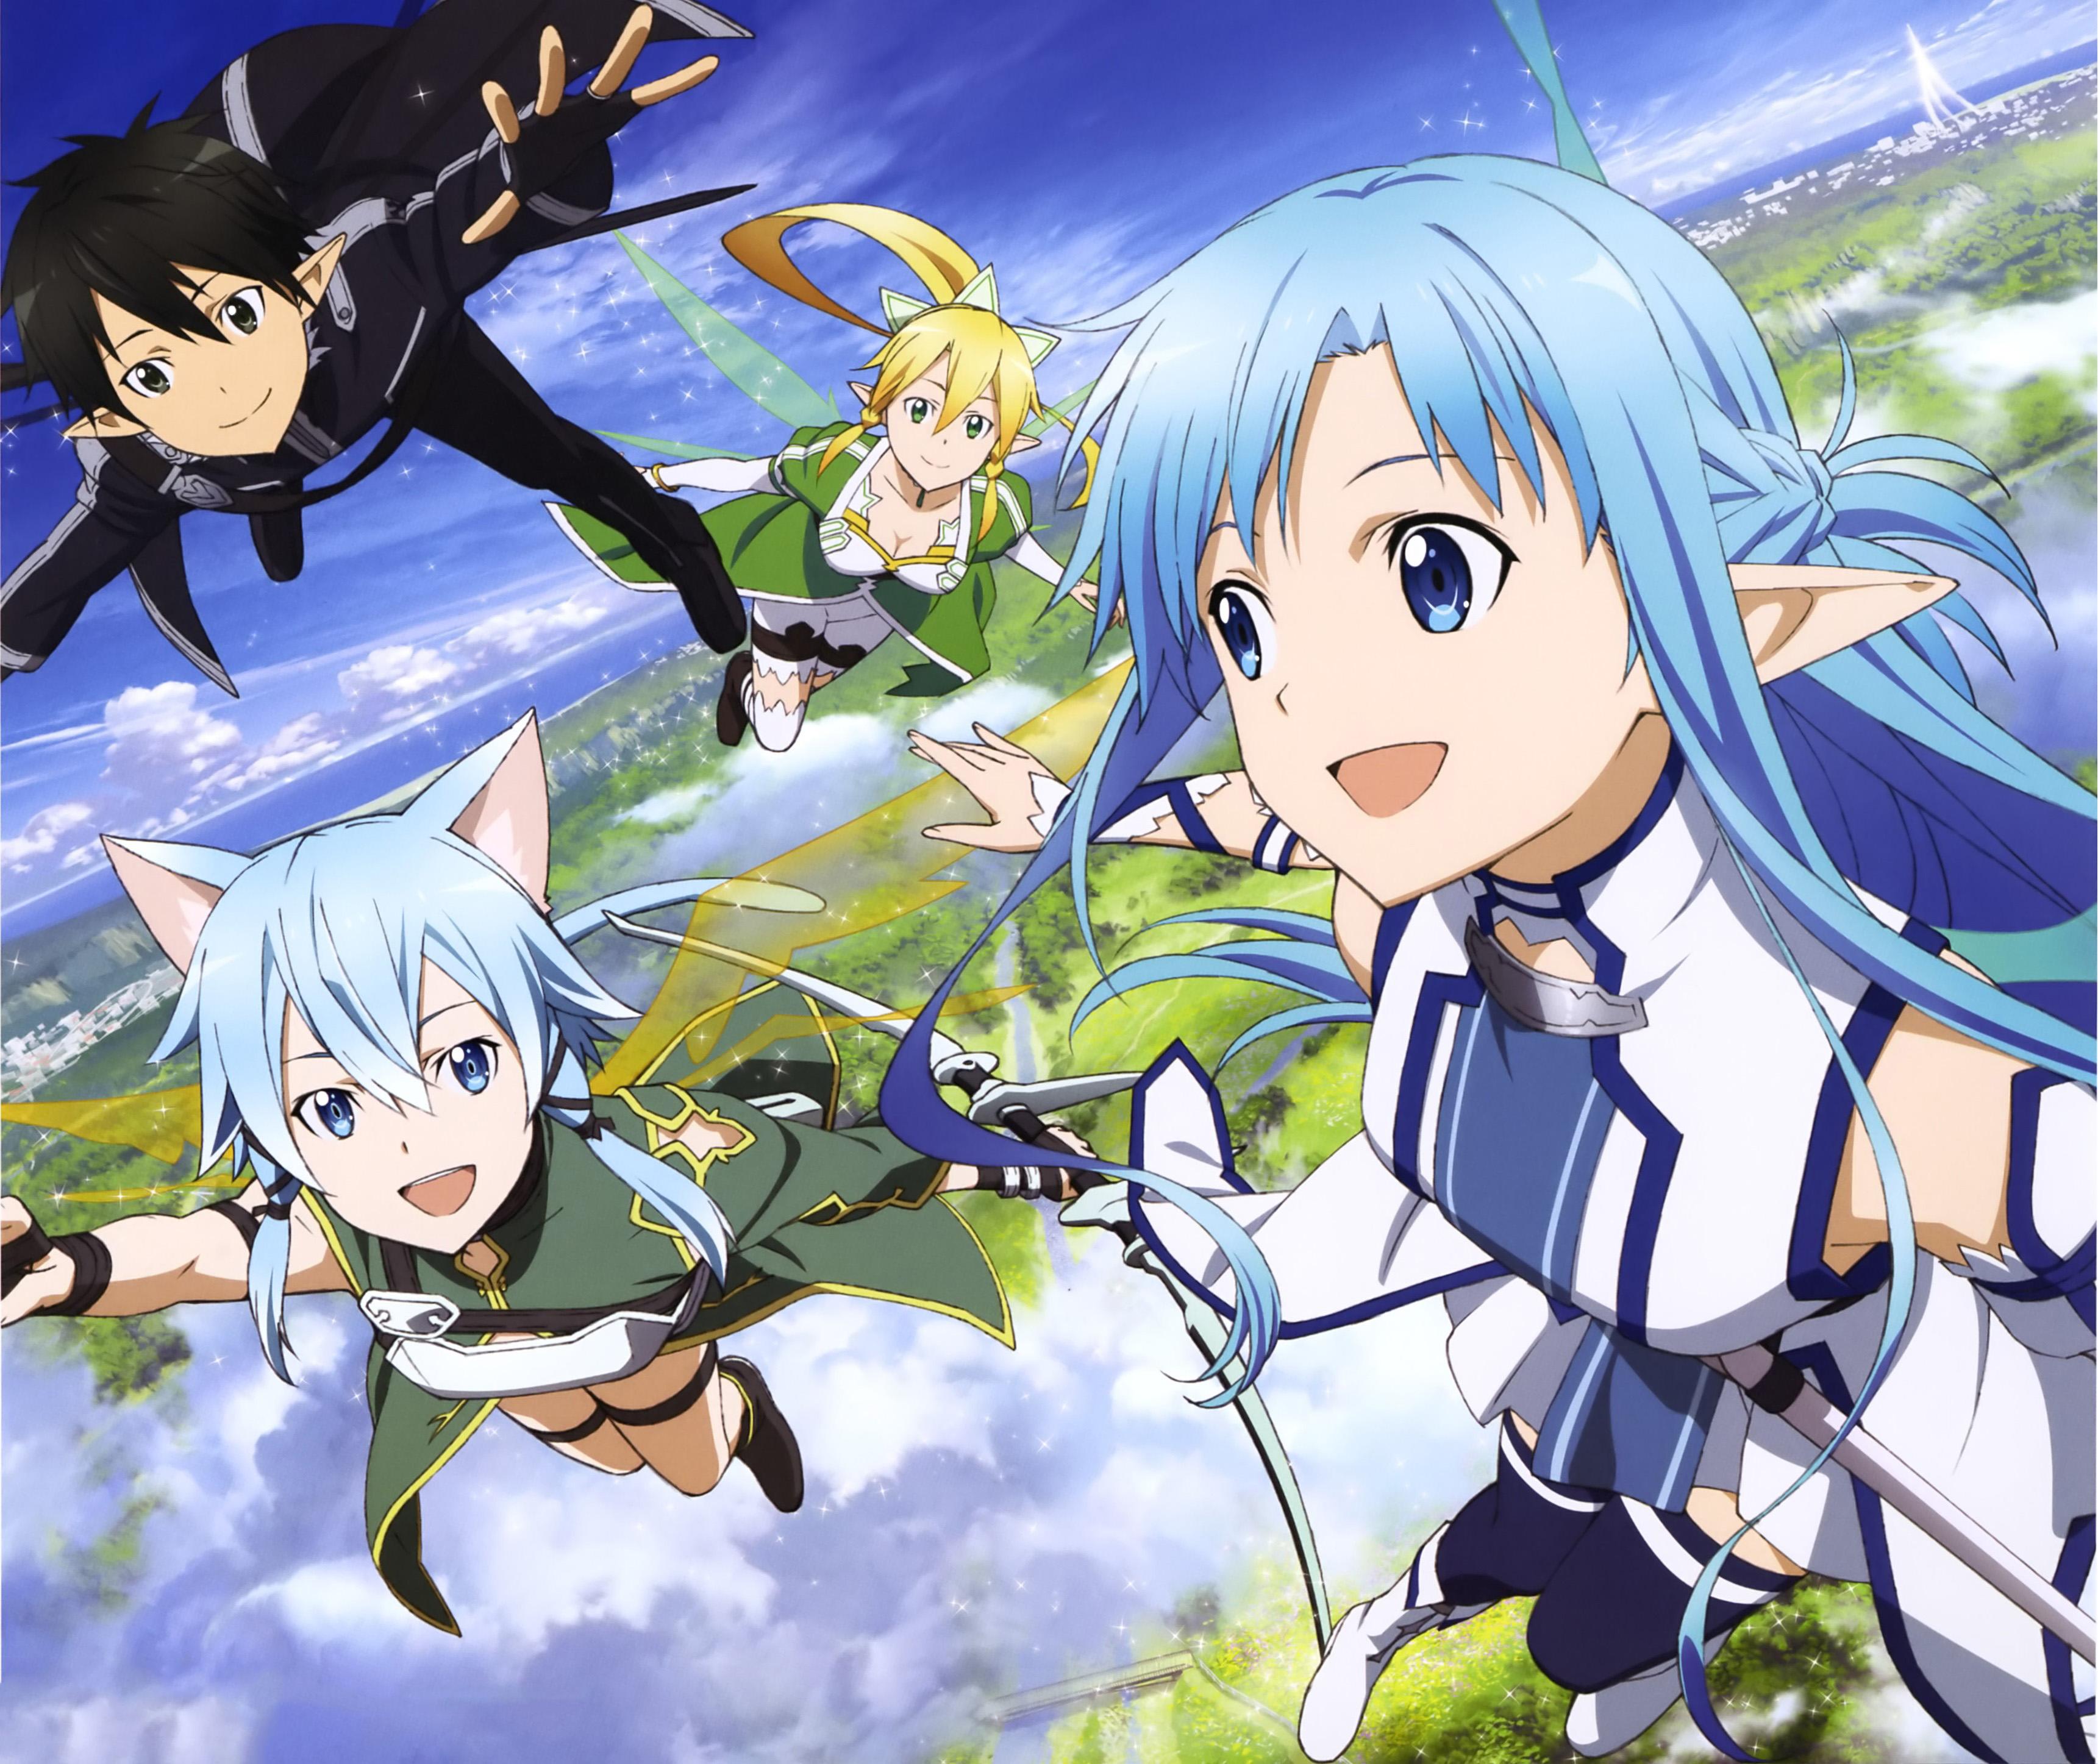 Online Wallpaper: Kirito, Sinon, Asuna And Leafa Full HD Wallpaper And